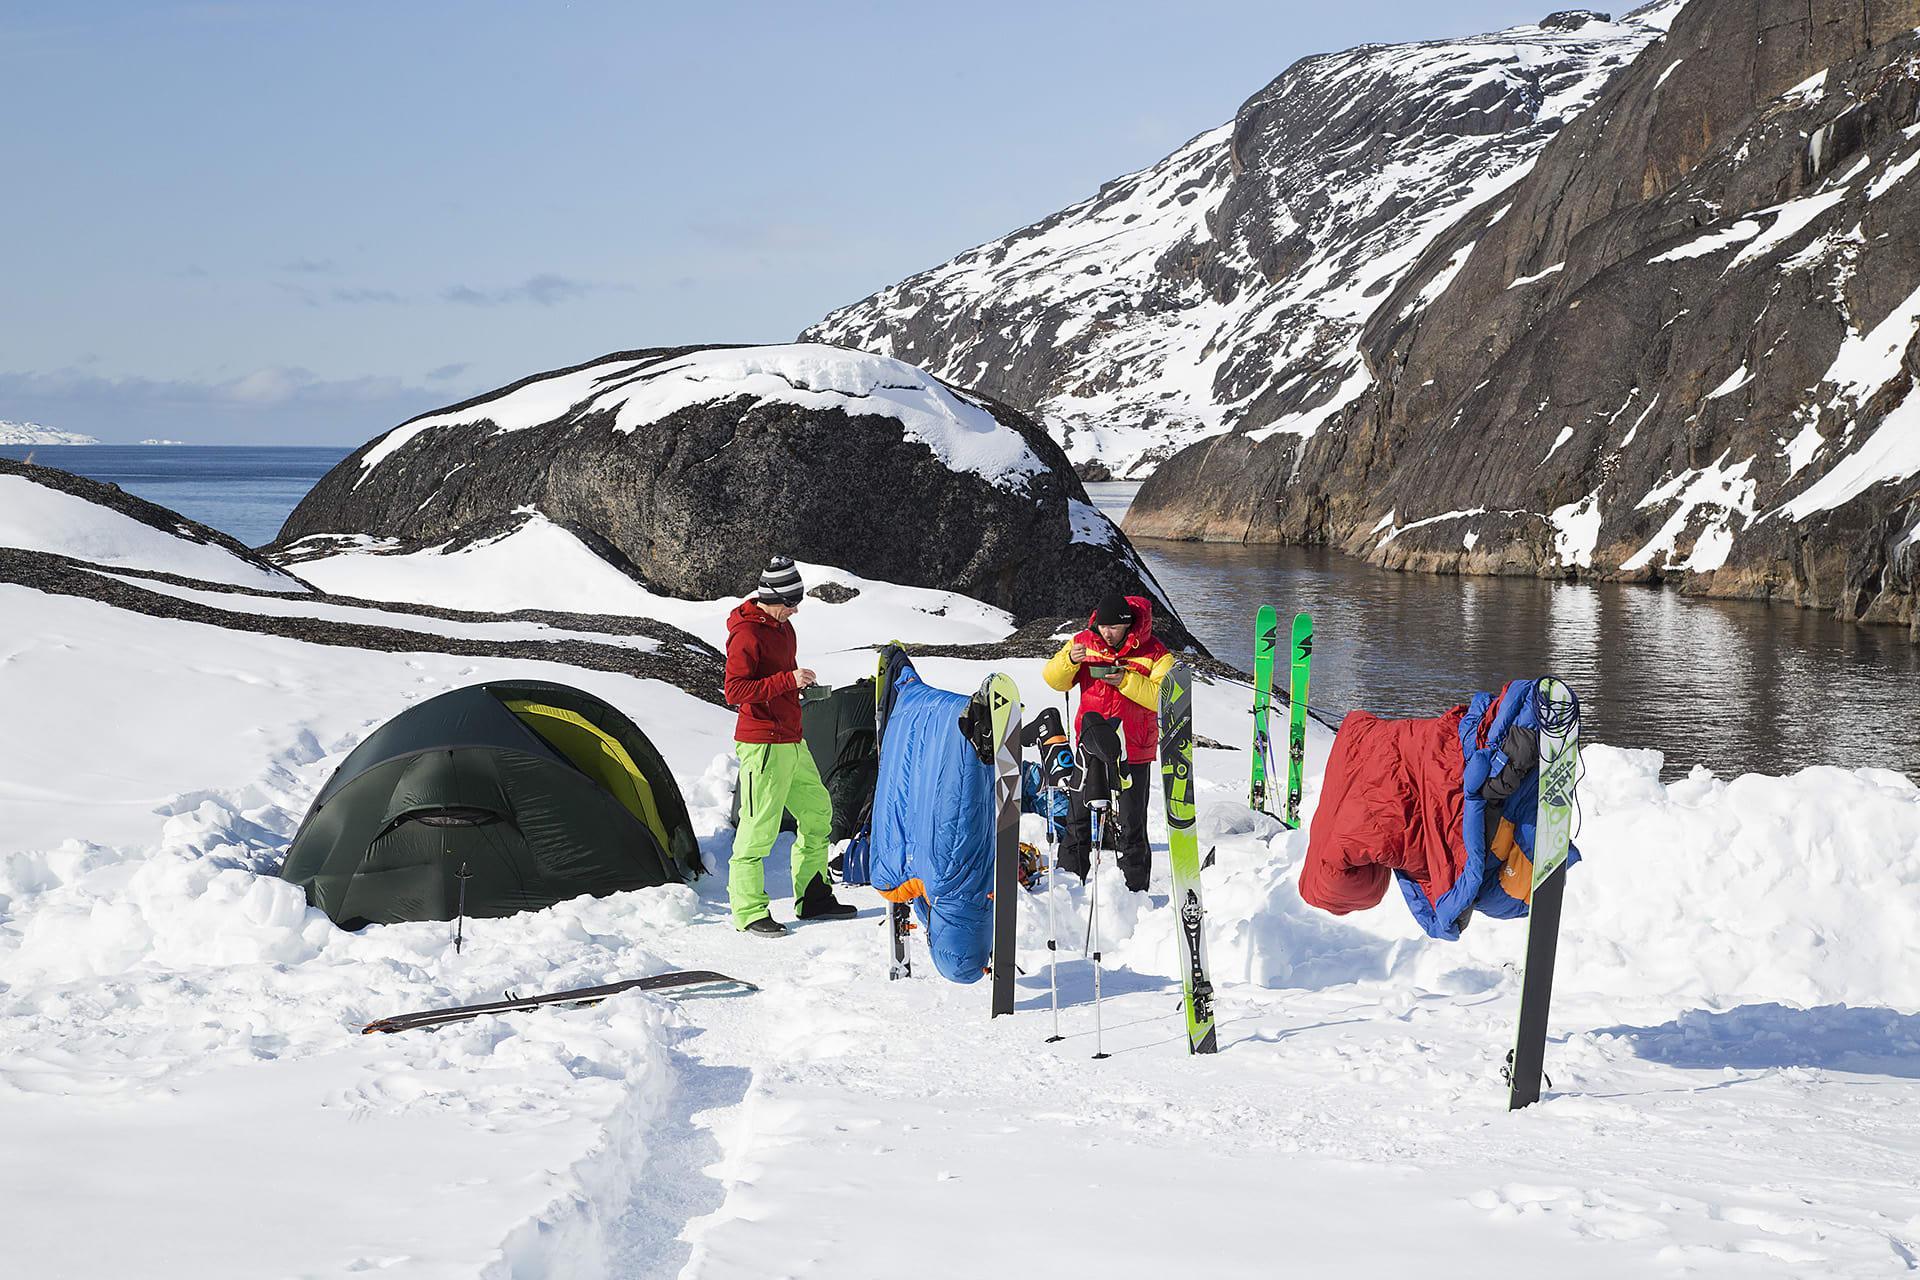 Johan Engebratt, Martin Letzter and Tom Seeman drying clothes in the base camp.